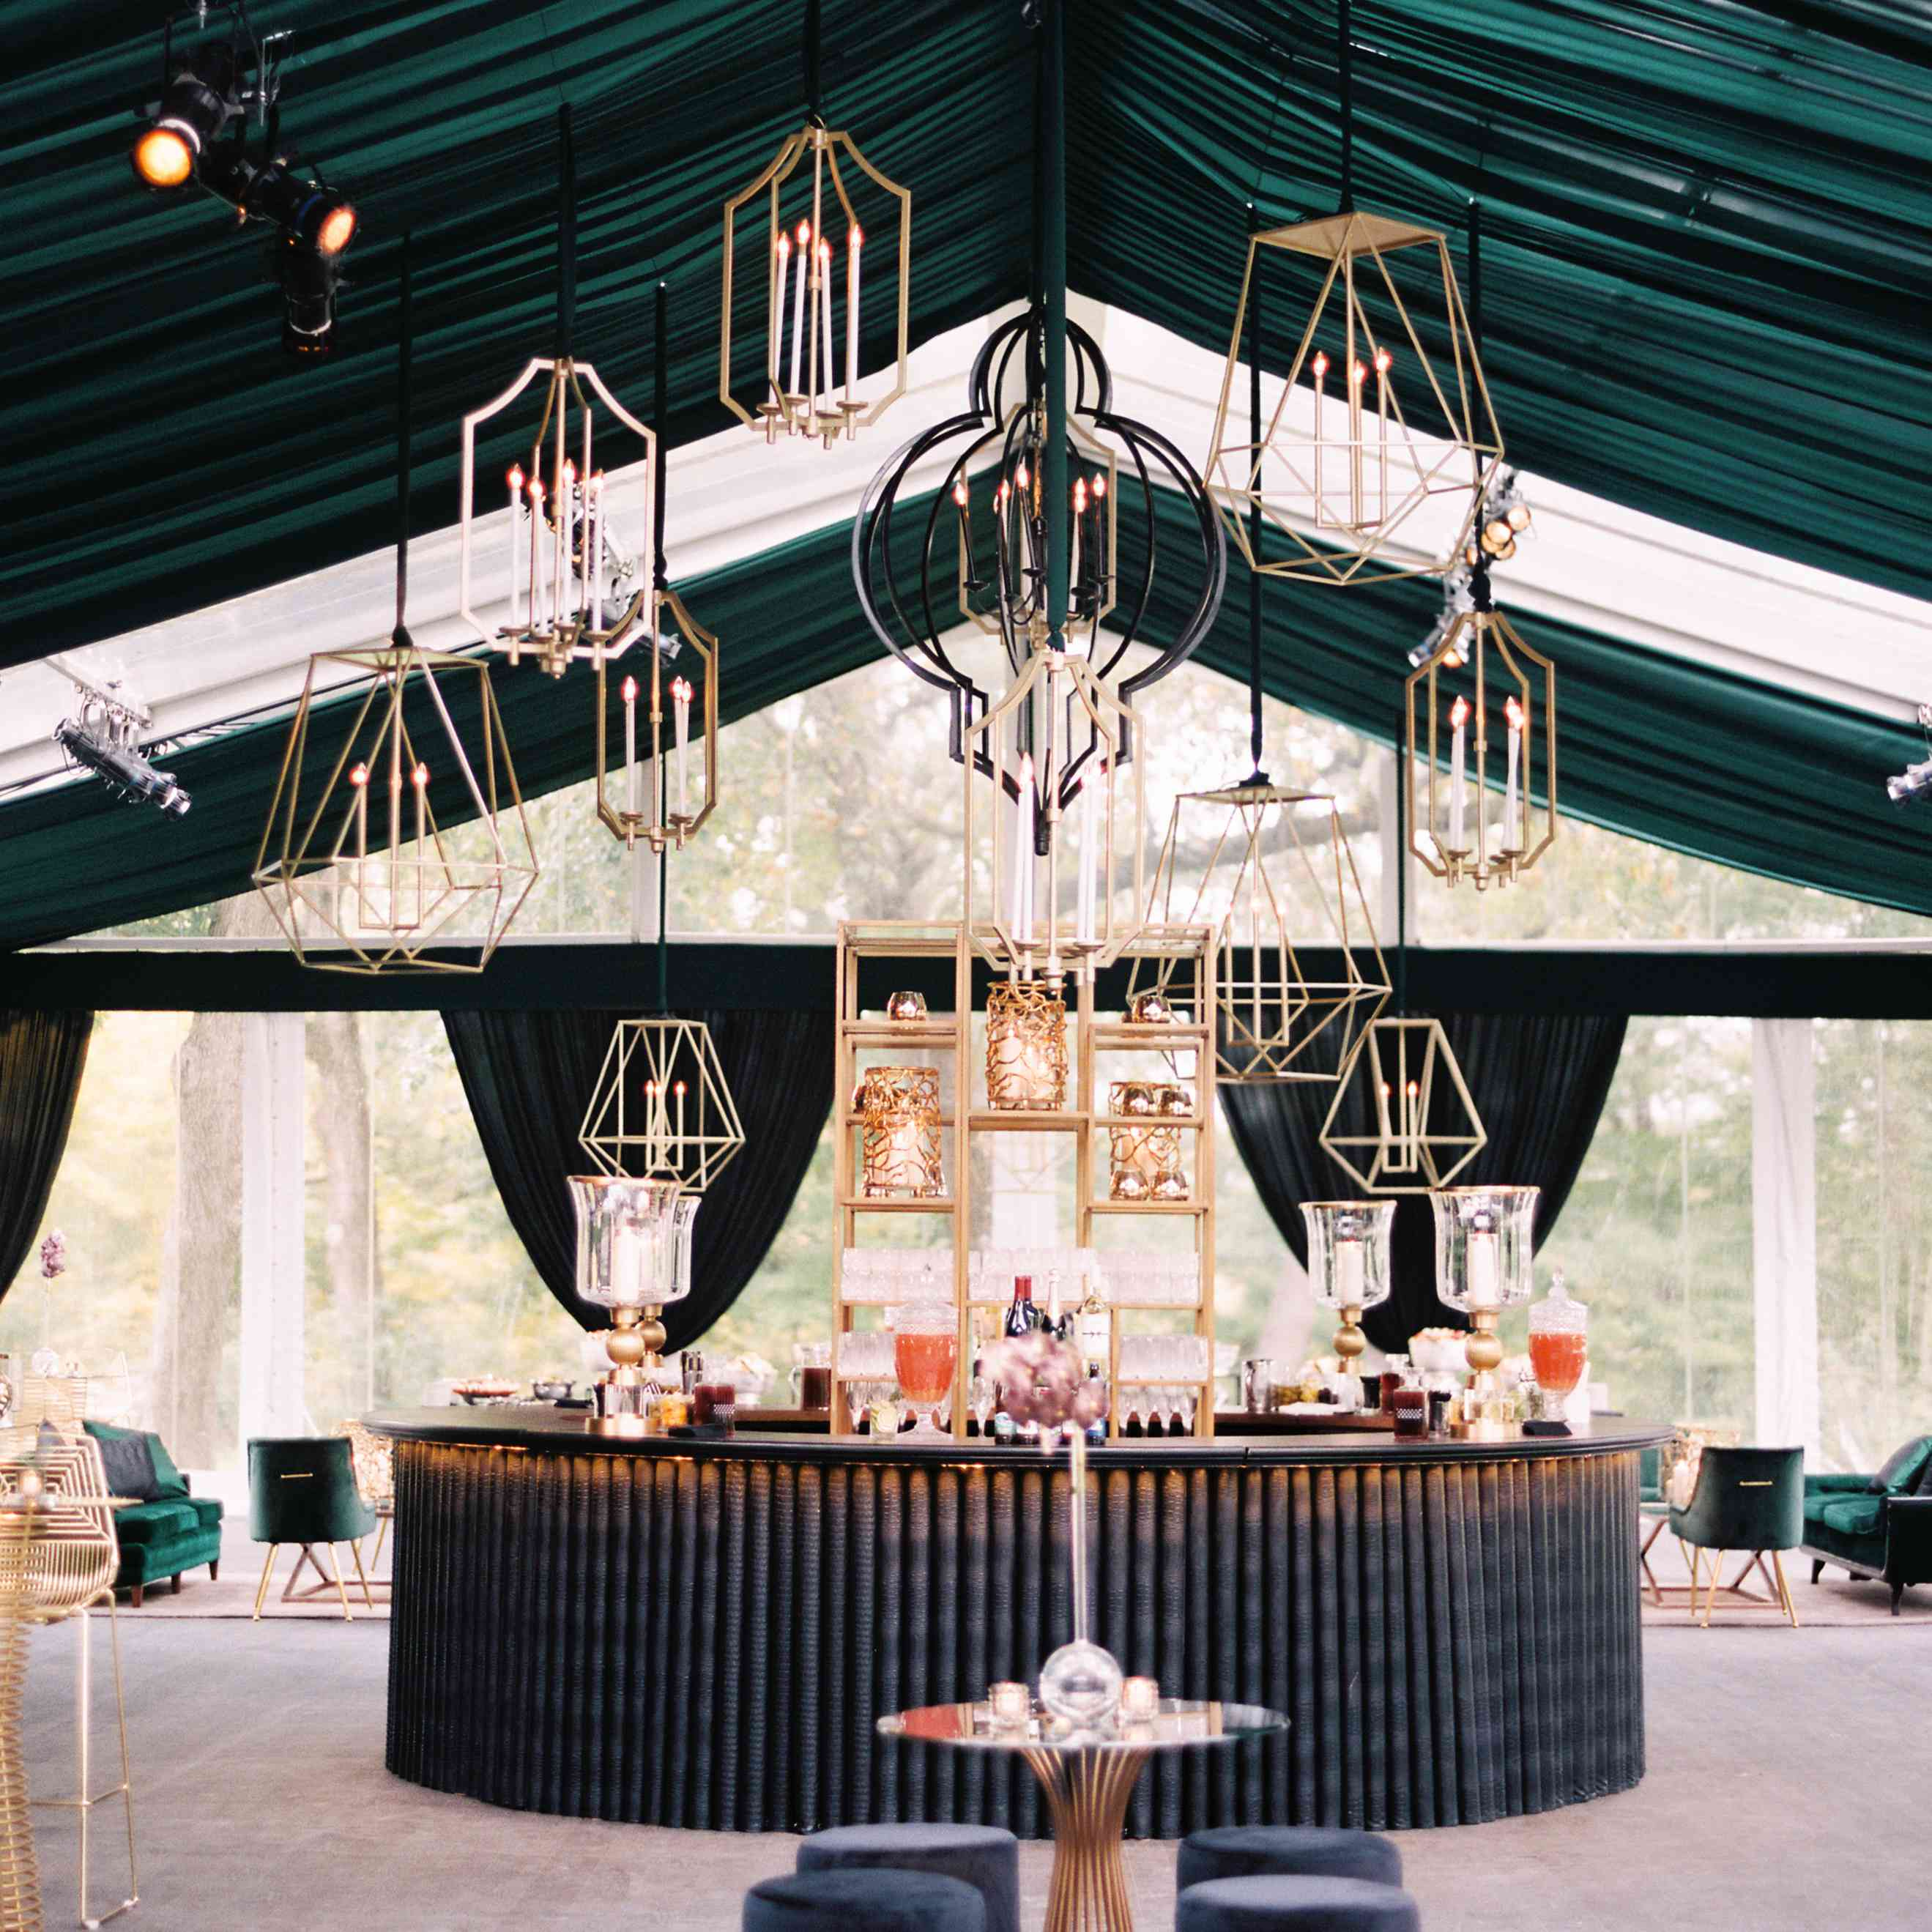 Reception bar area